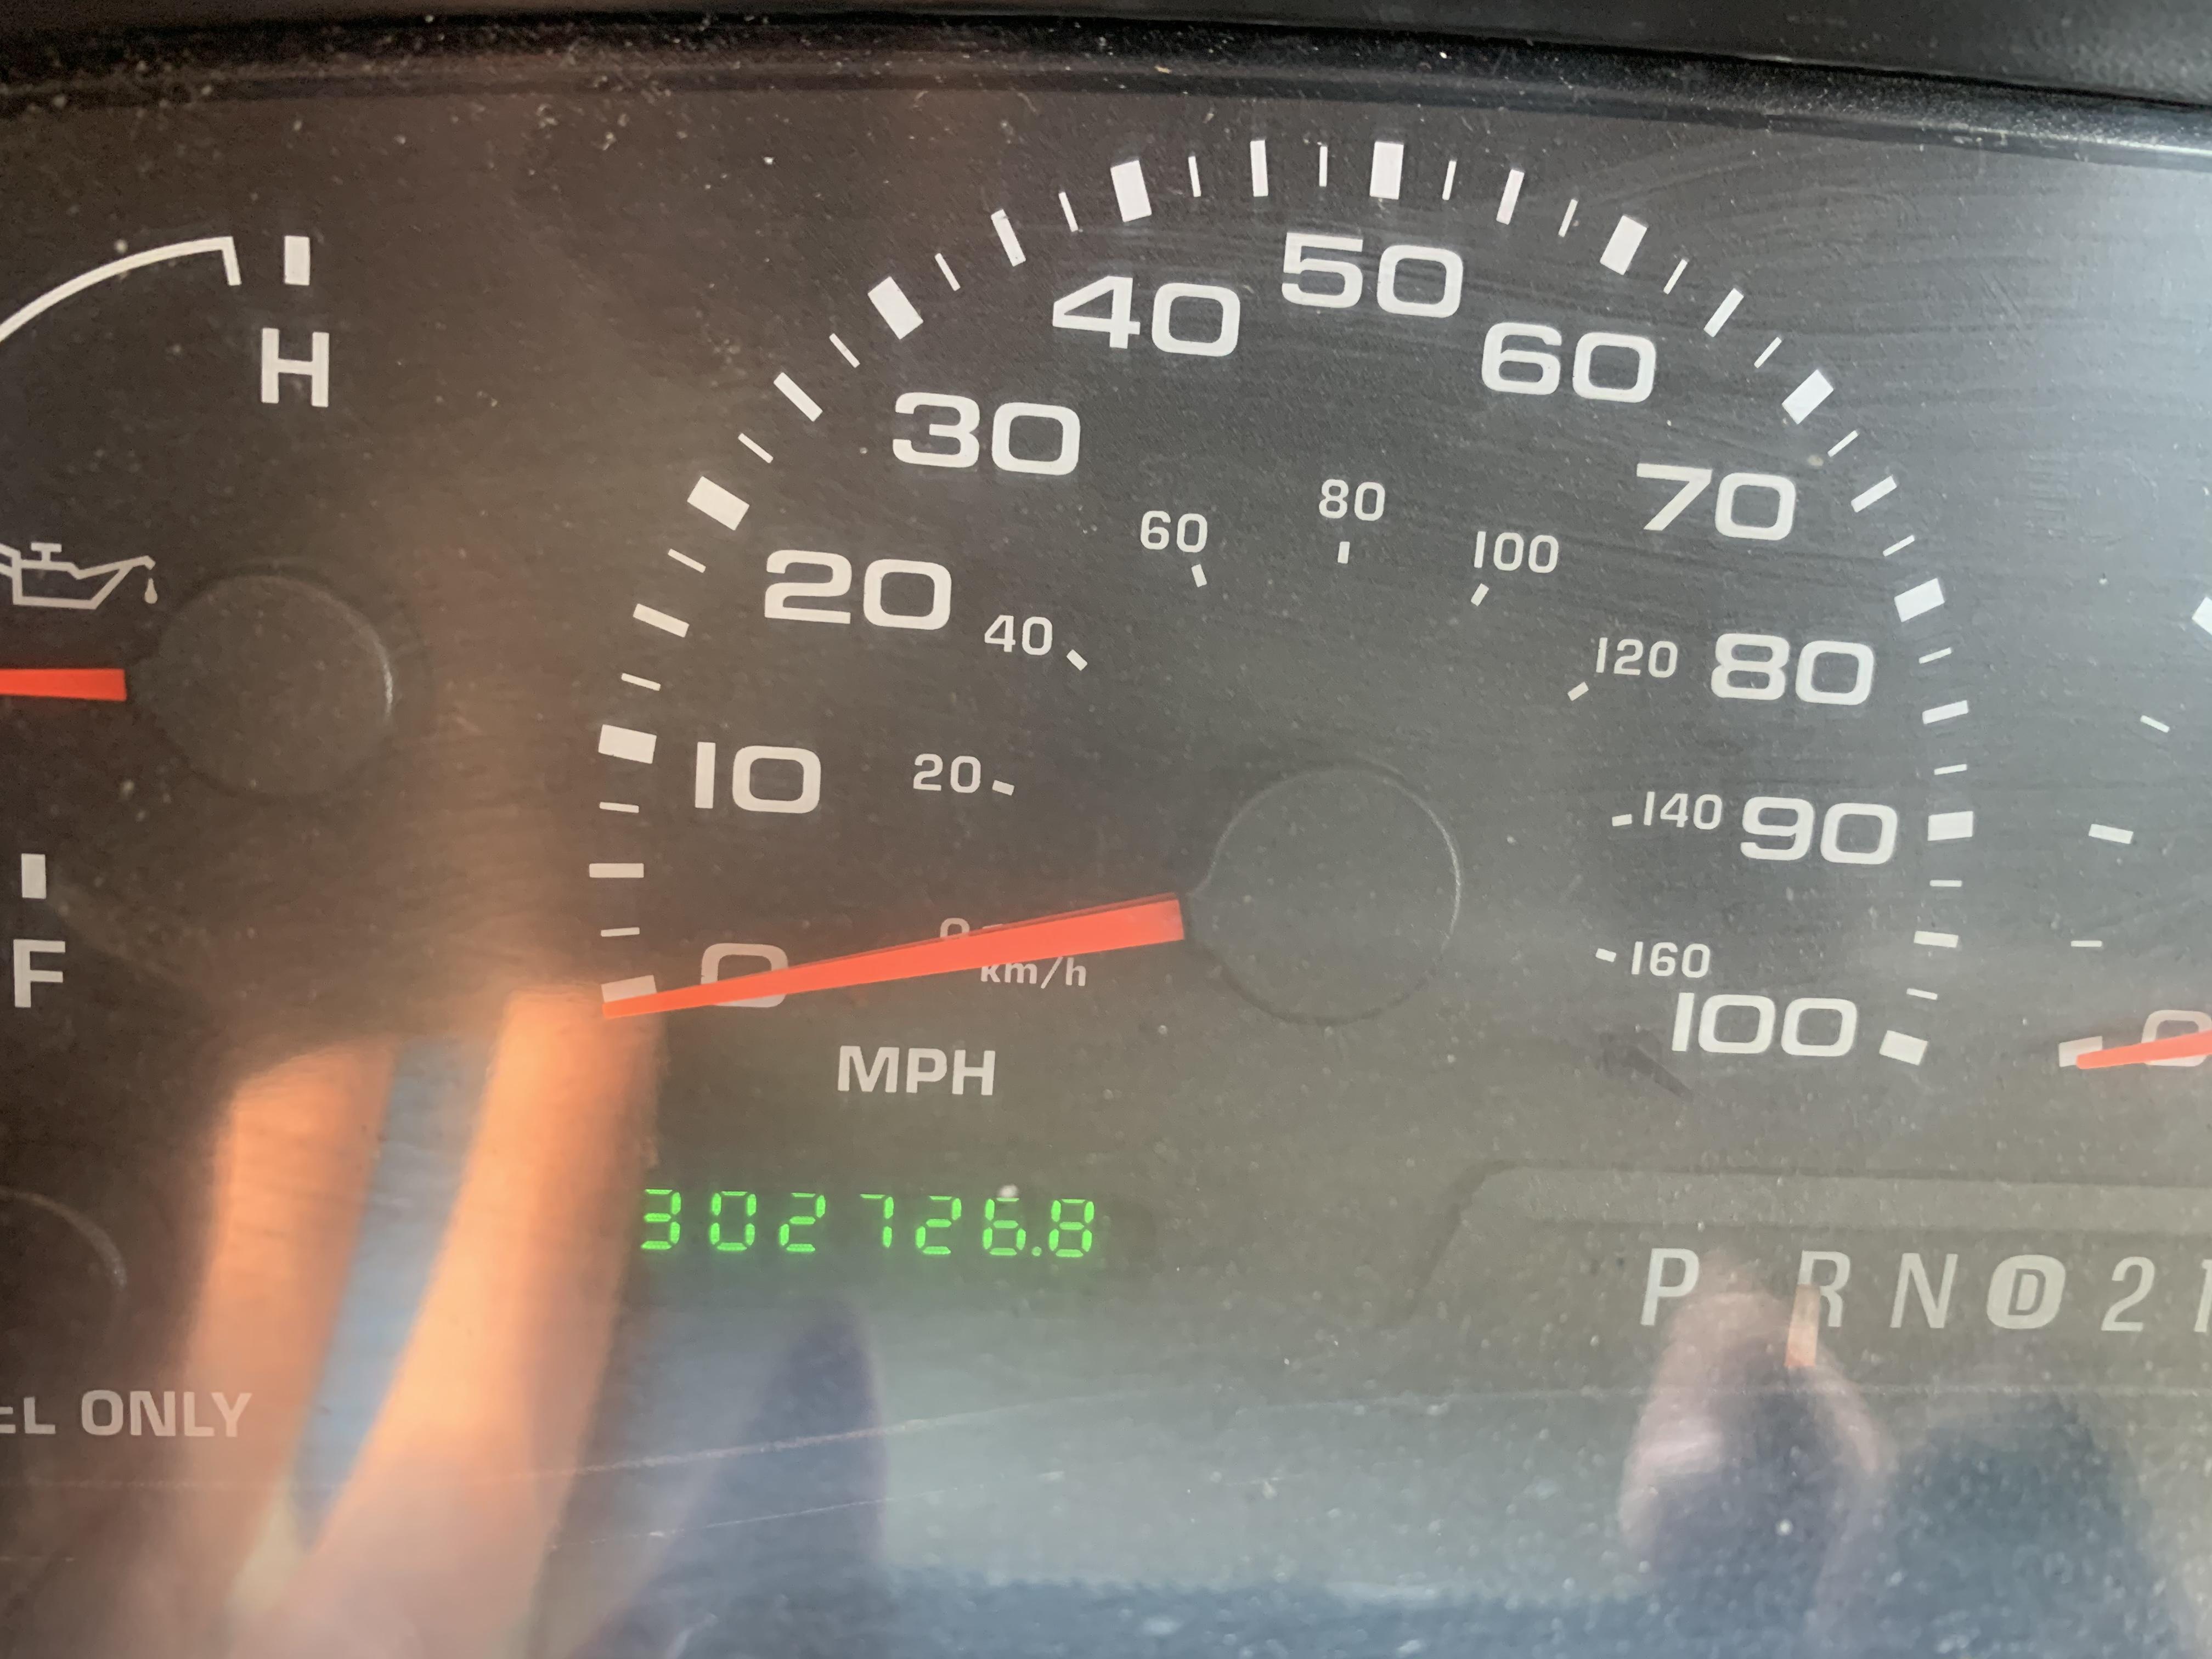 Lot 53 - 2001 F-350 2WD. 7.3 Diesel Automatic Service Truck